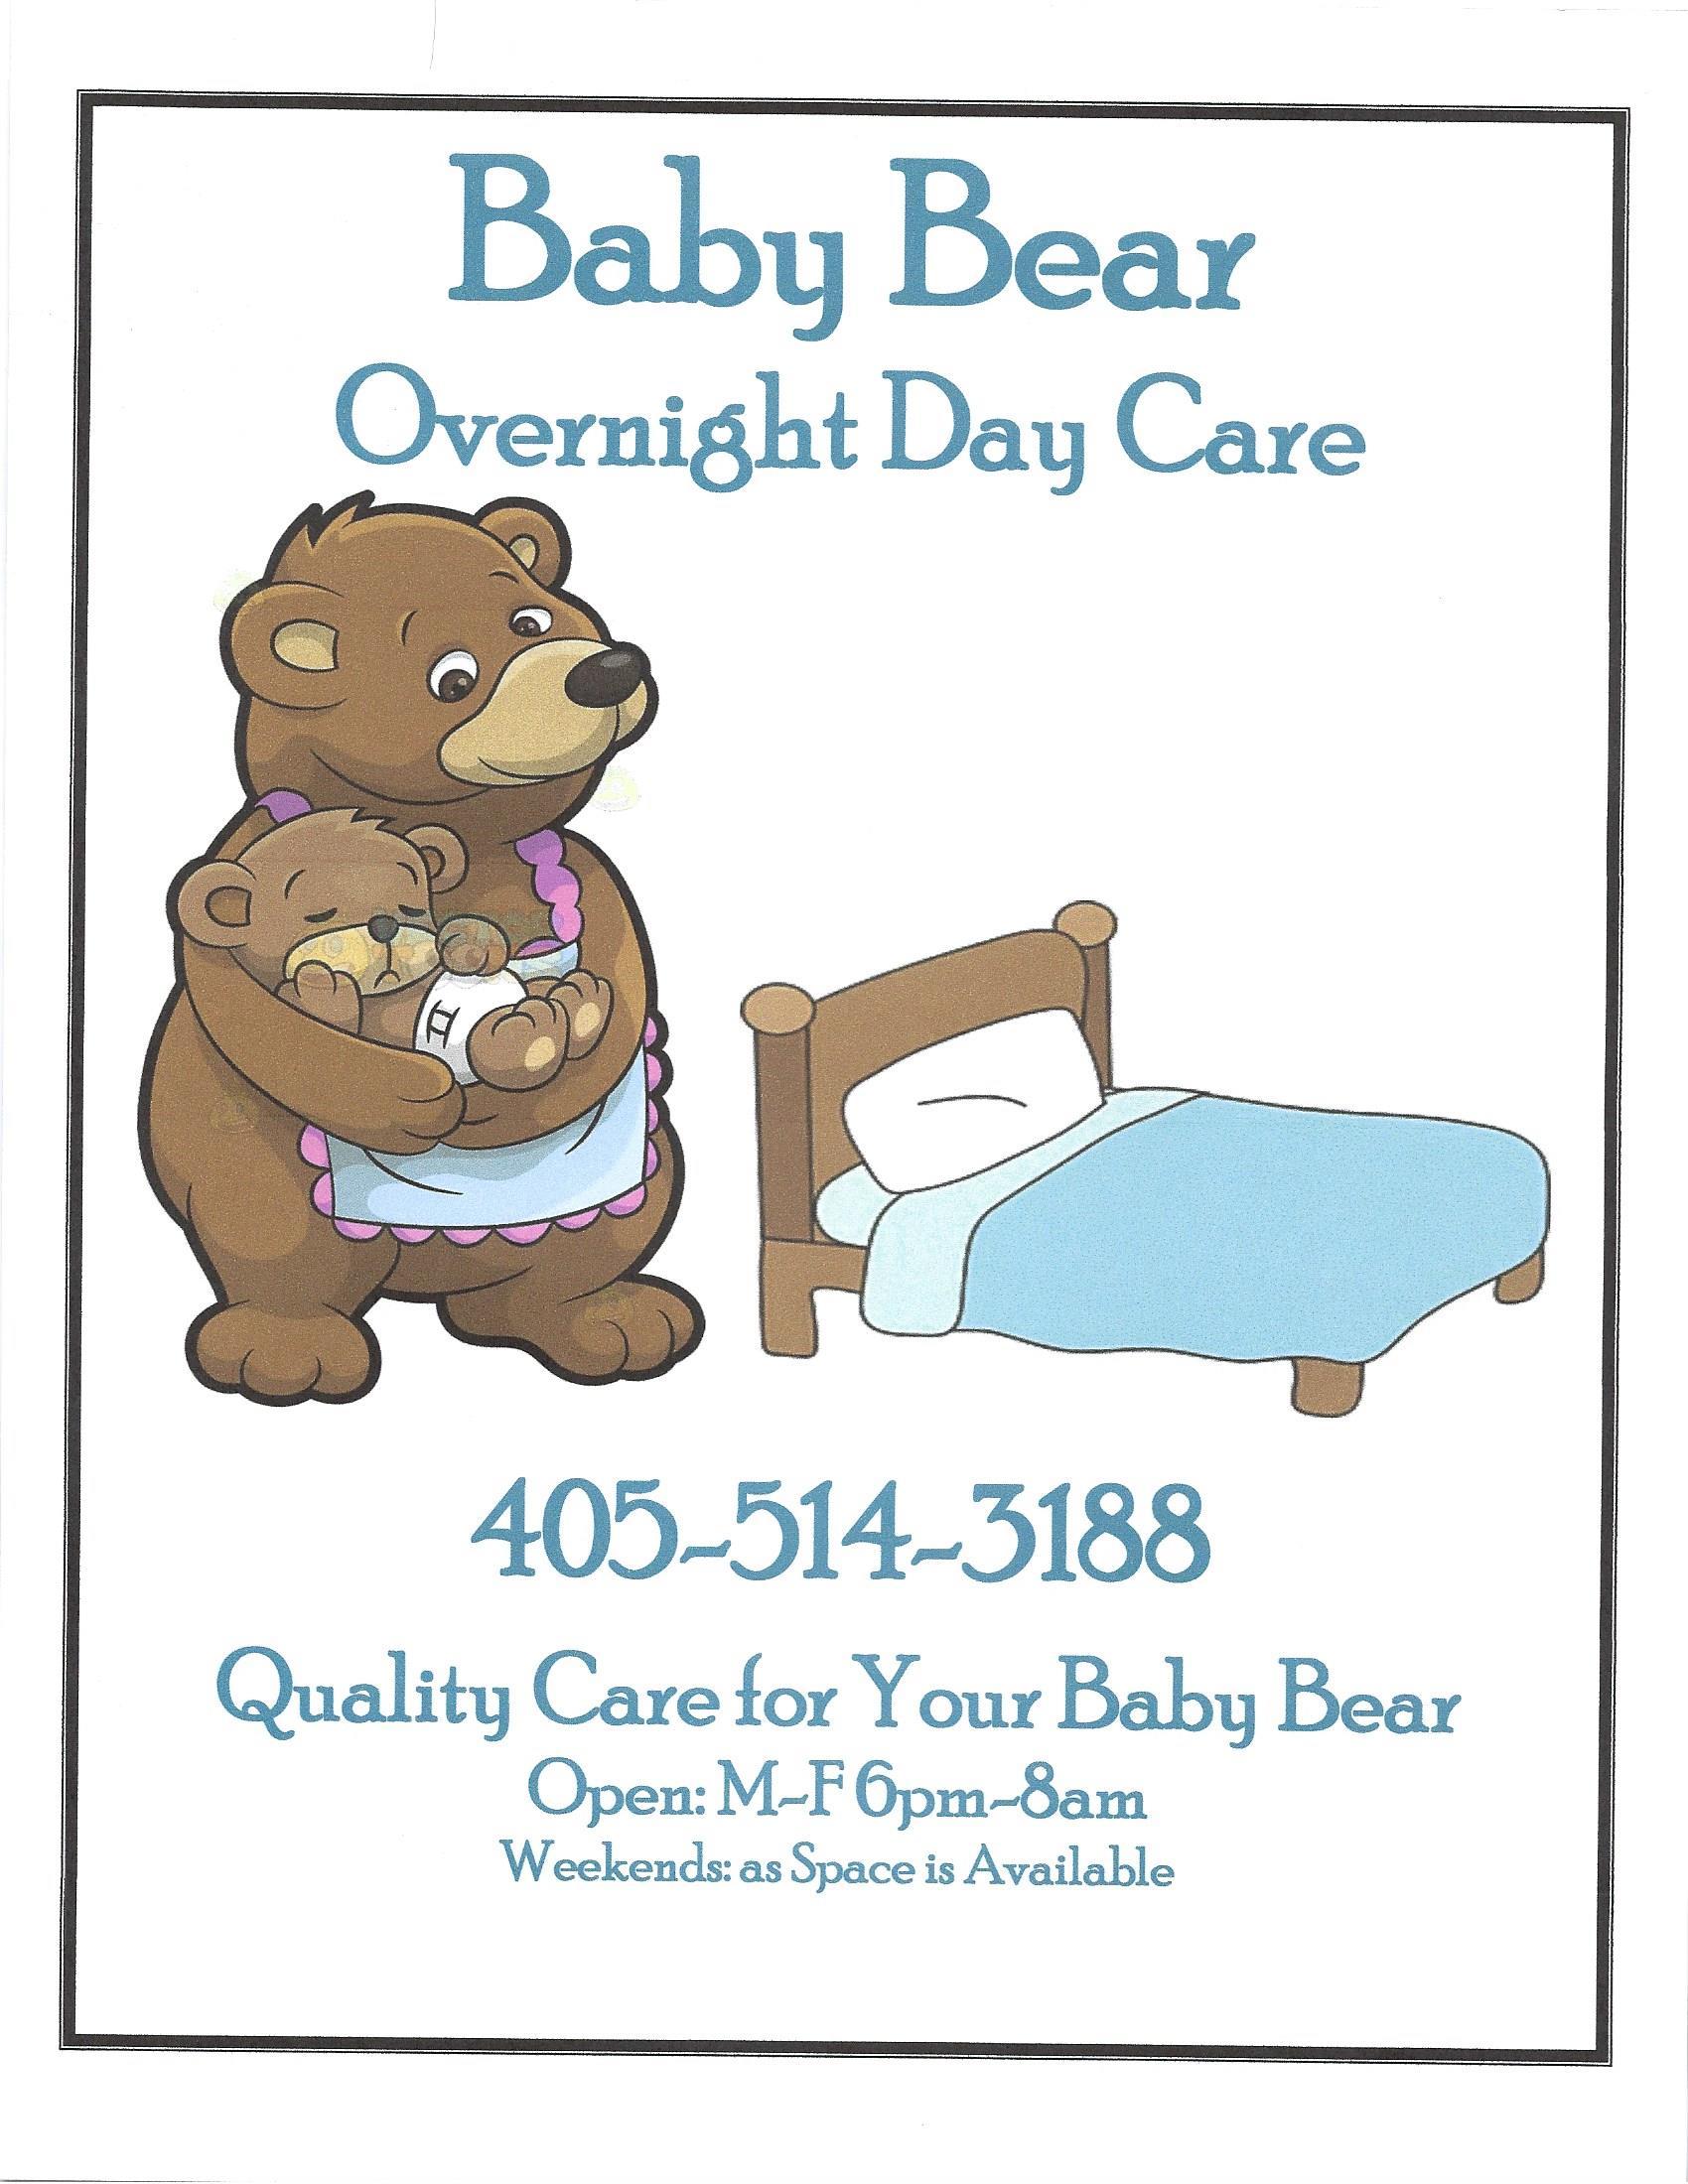 Baby Bear Overnight Daycare